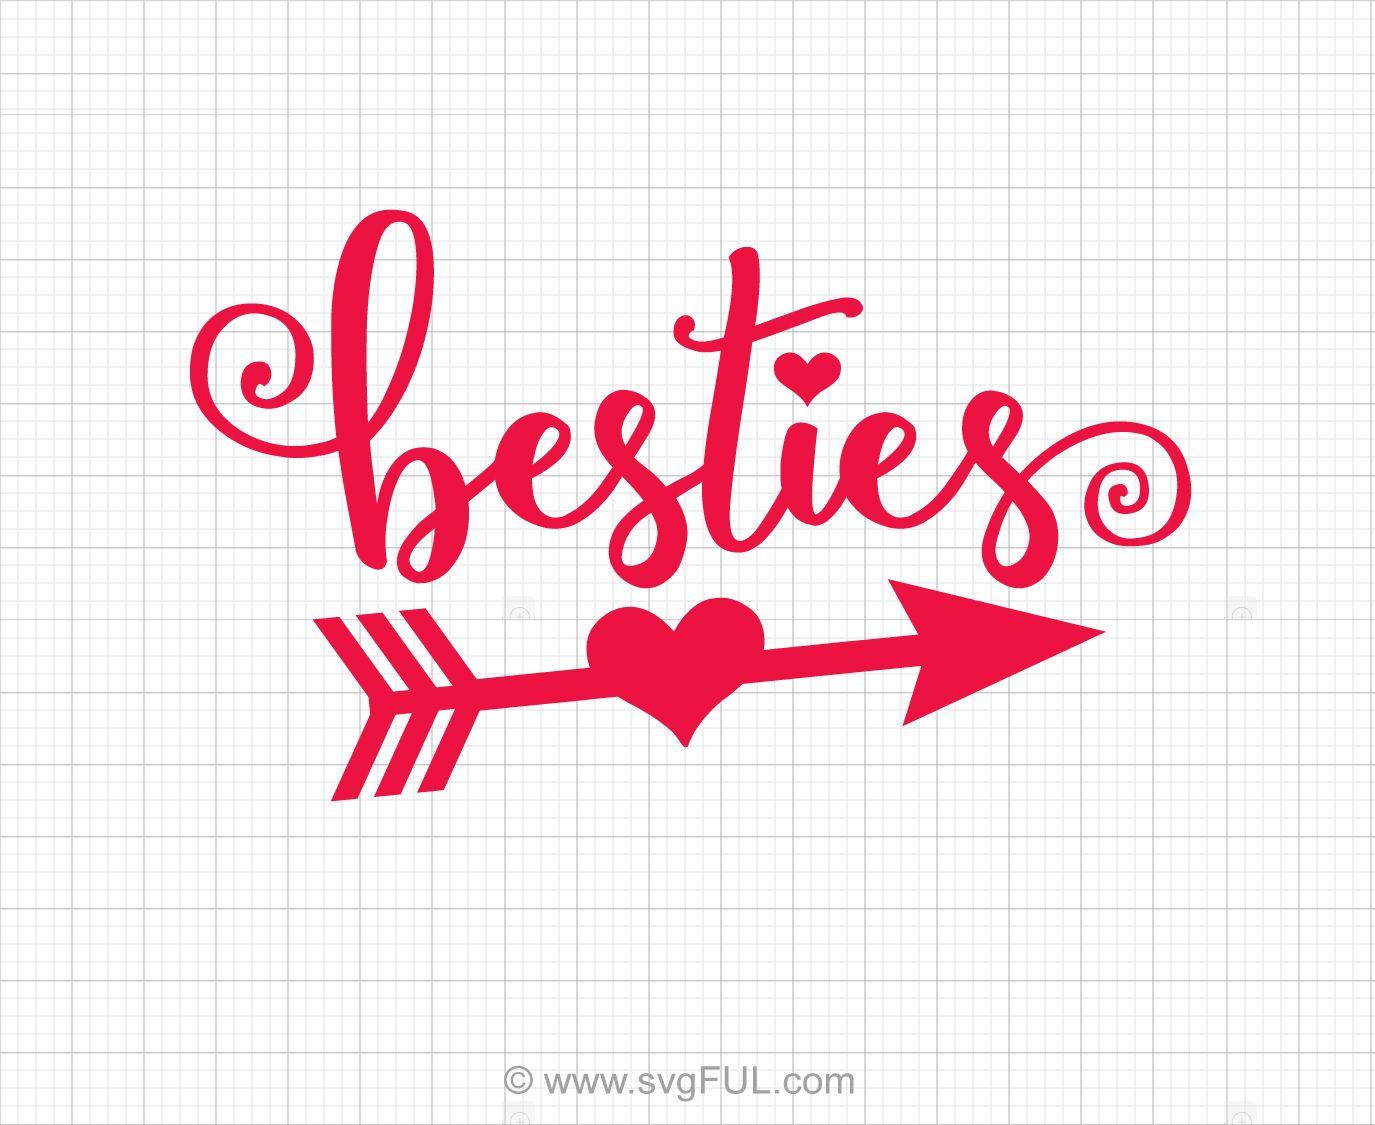 Besties Best Friends Svg Saying.